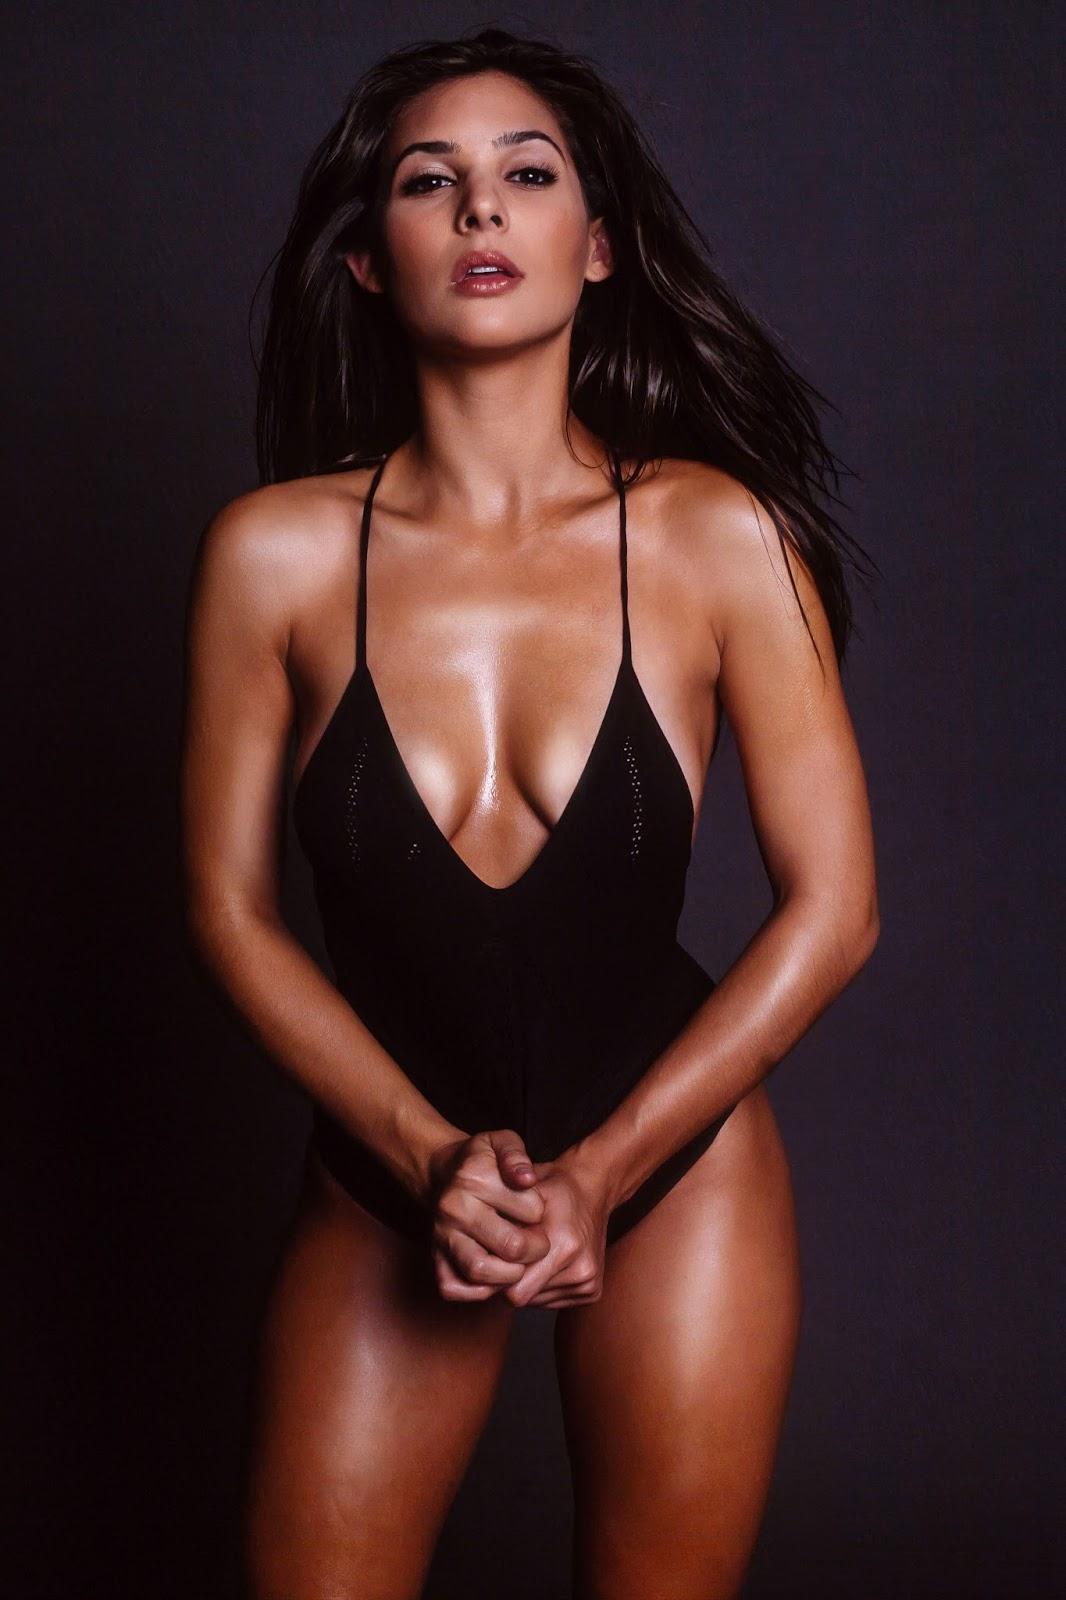 camila banus cleavage photos